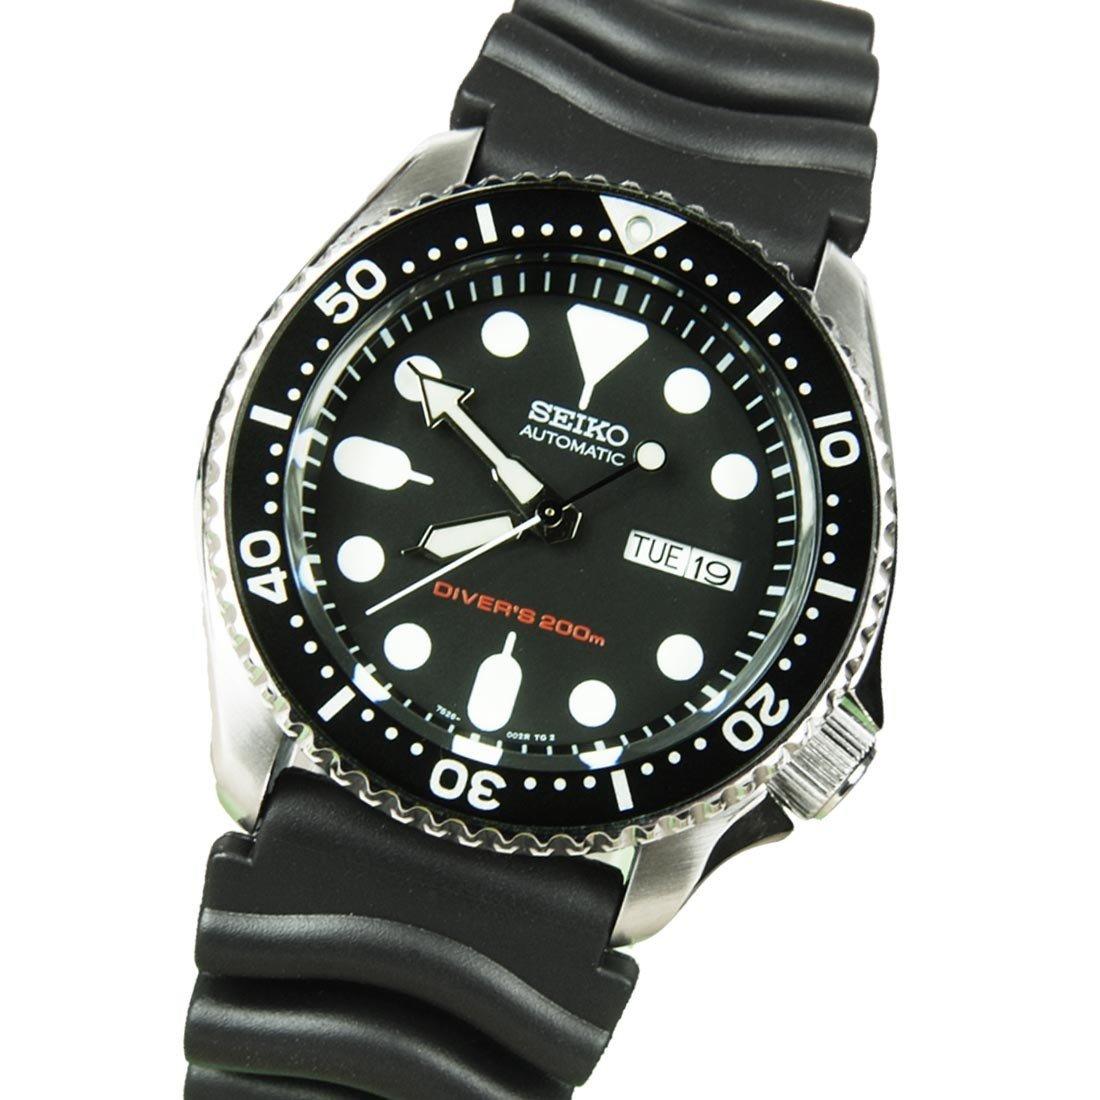 Reloj Seiko RUBBER Automatic watch SKX007K1